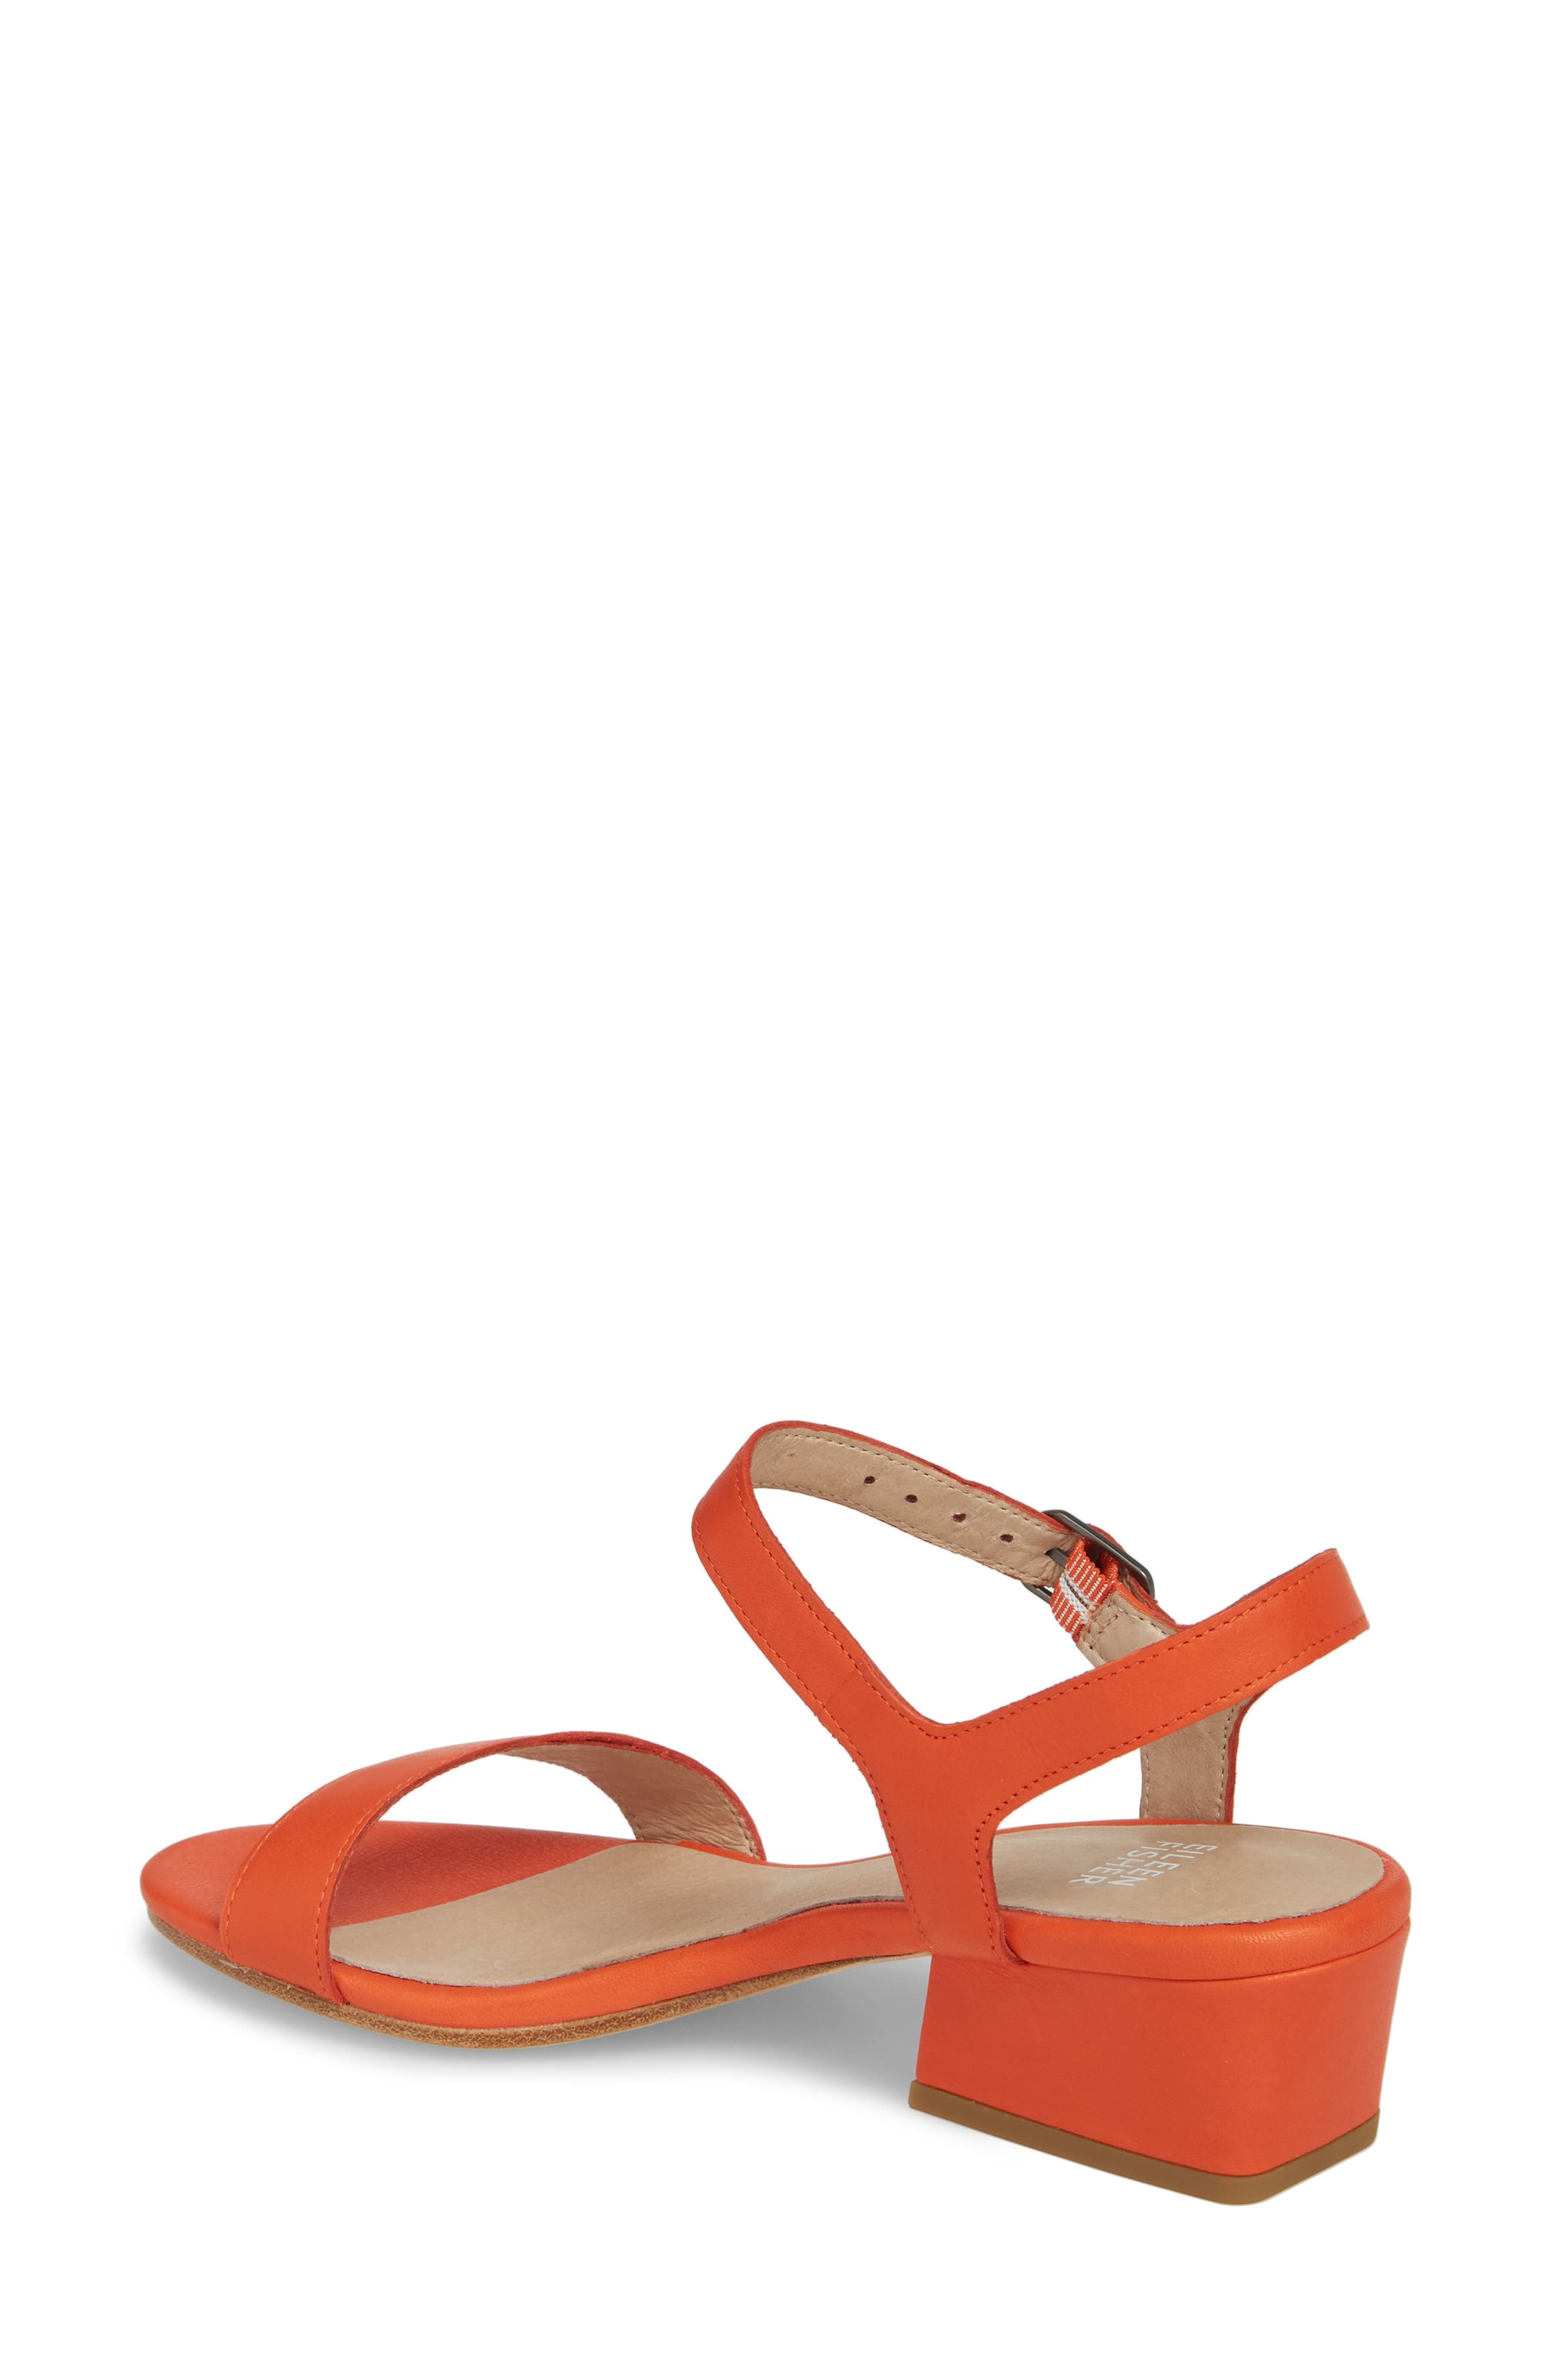 Olean Quarter Strap Sandal,                             Alternate thumbnail 2, color,                             Blood Orange Leather